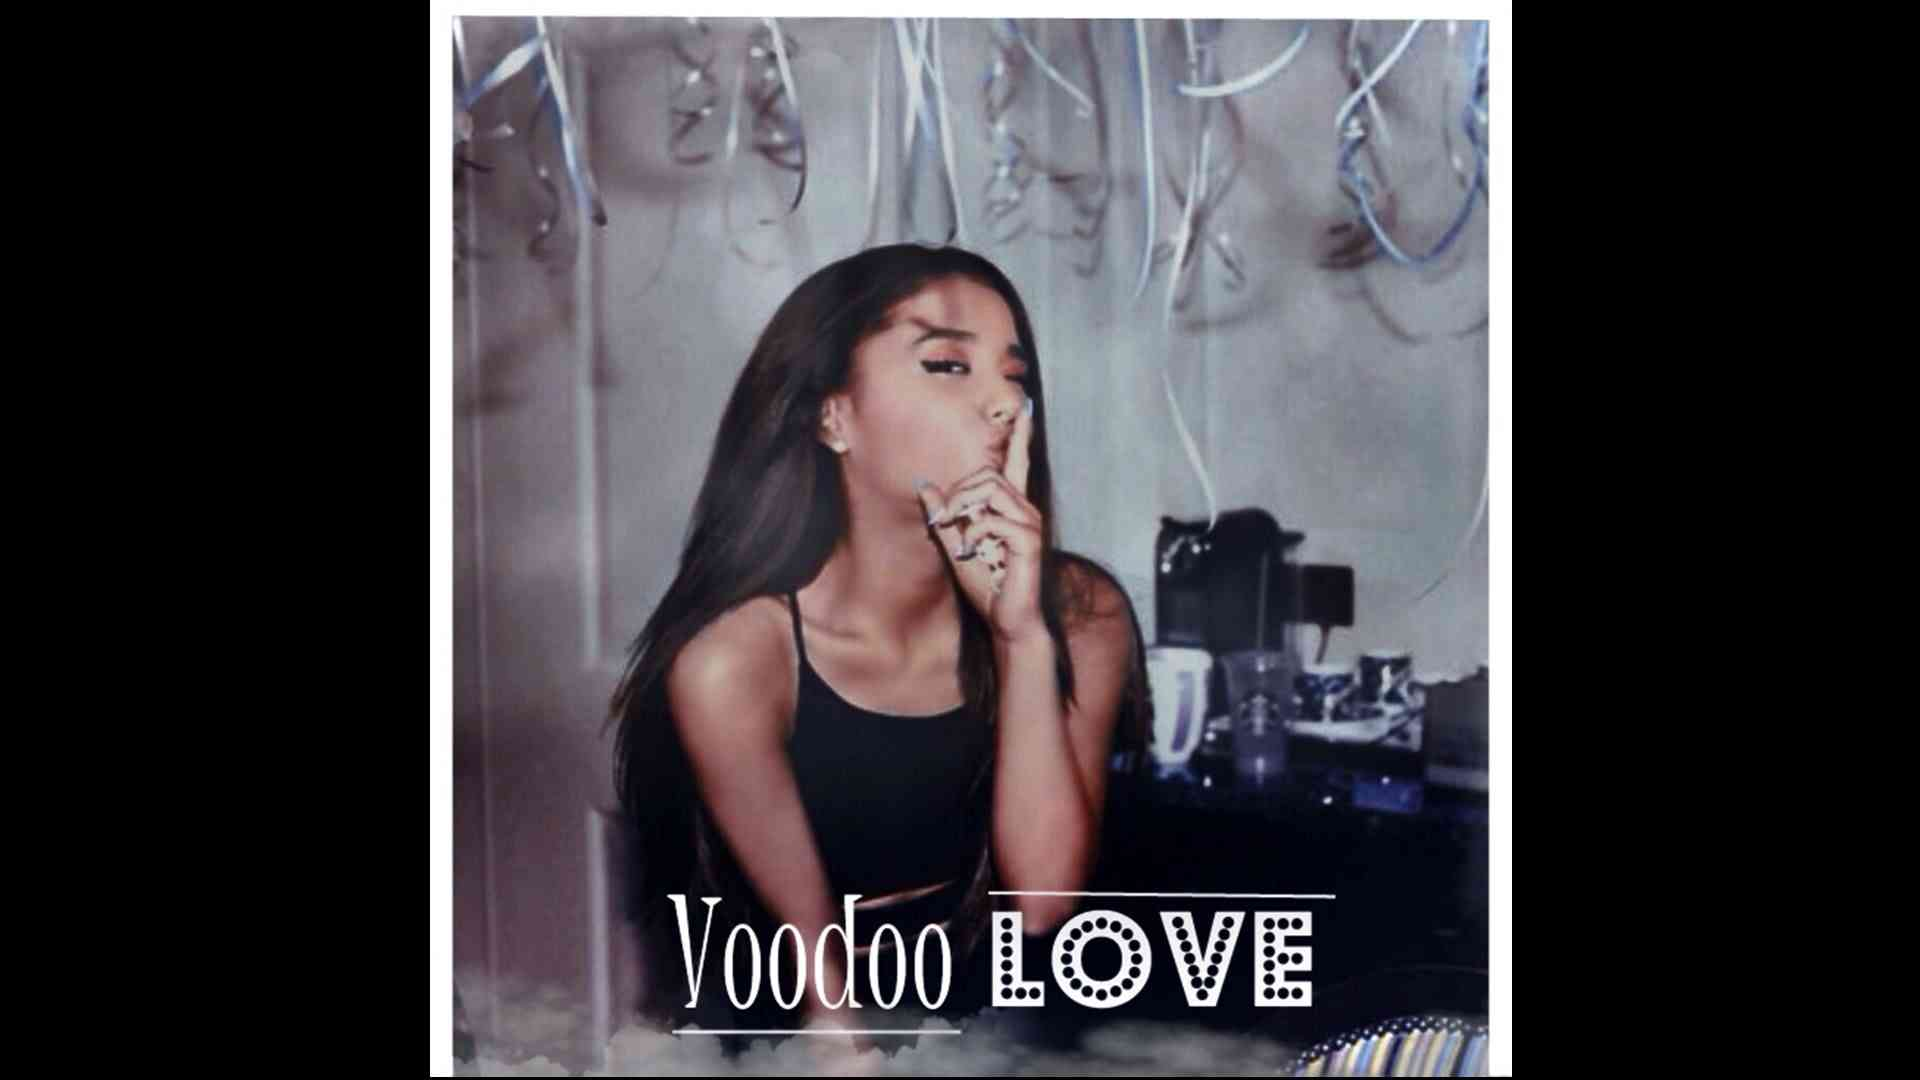 Ariana Grande - Voodoo Love - (Studio Version) Audio - YouTube